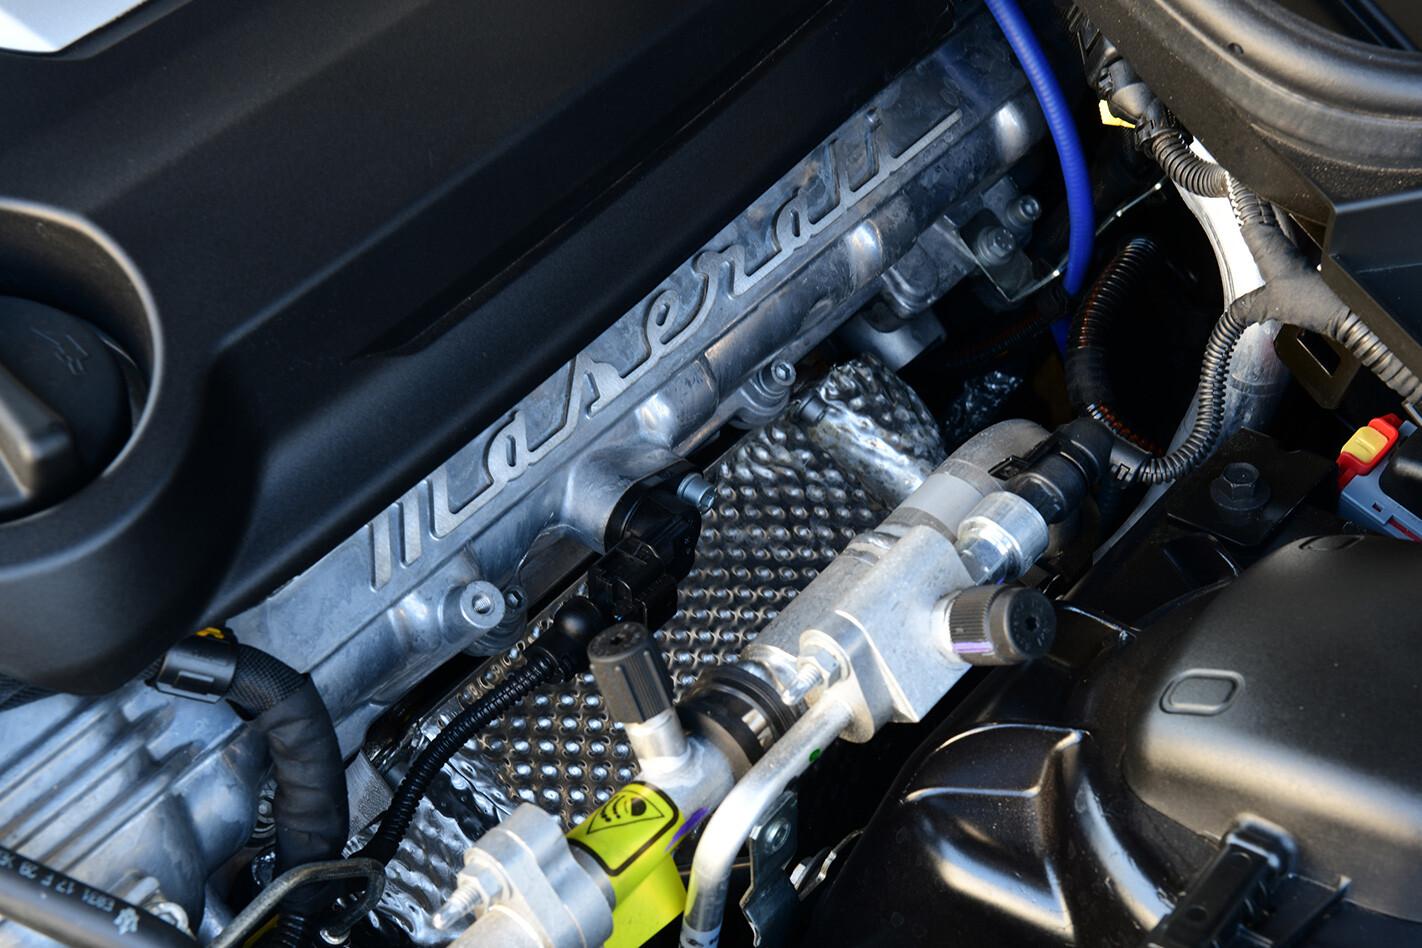 2018 Maserati Ghibli S GranSport  engine